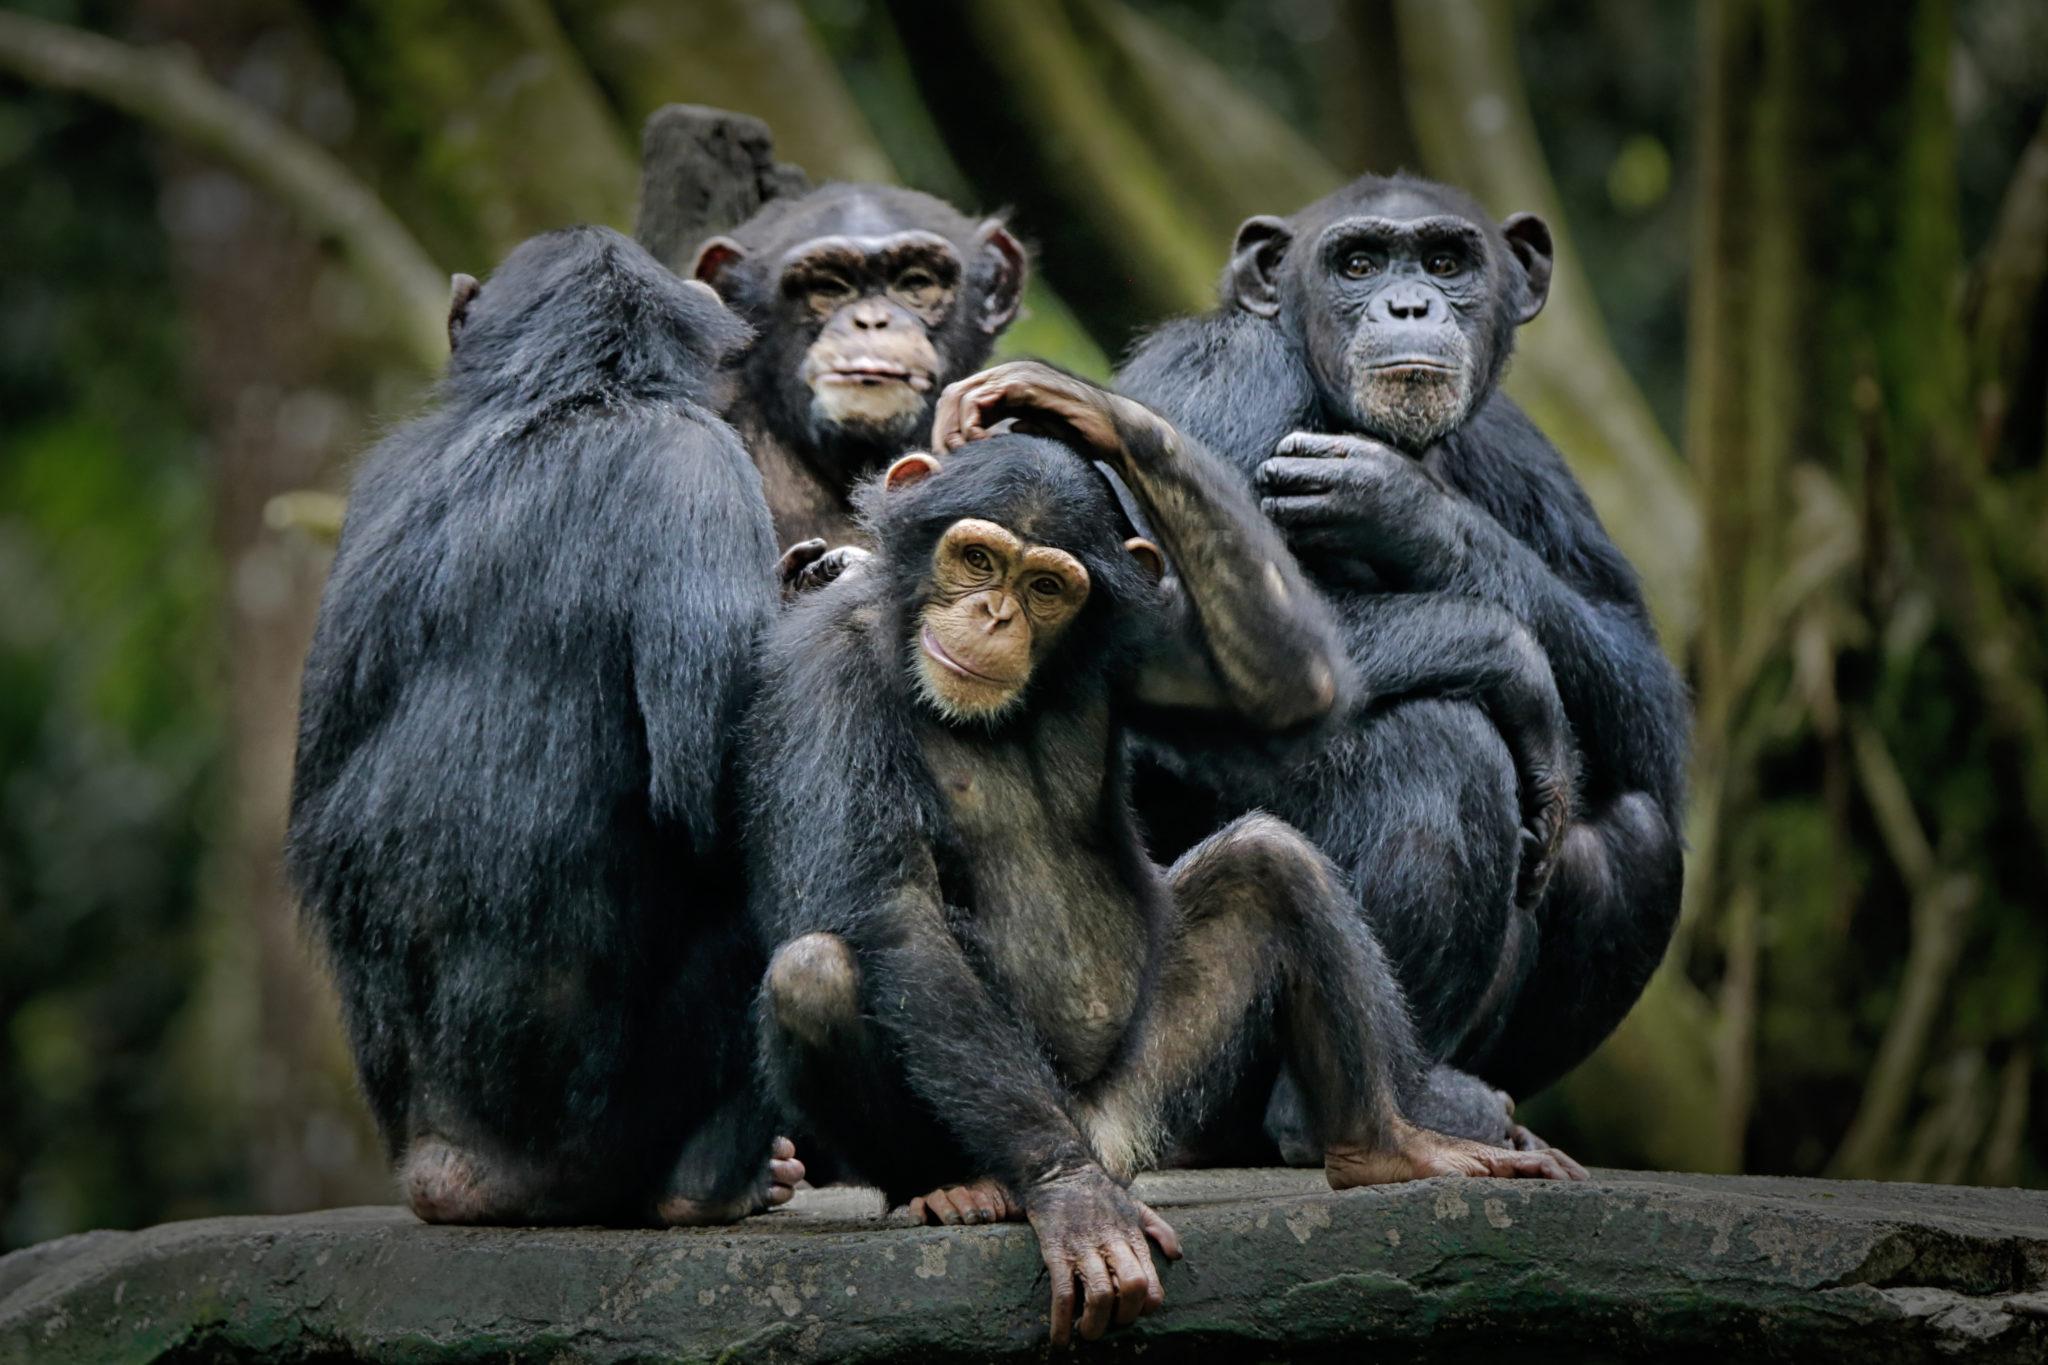 Chimpanzee,Consists,Of,Two,Extant,Species:,Common,Chimpanzee,And,Bonobo.